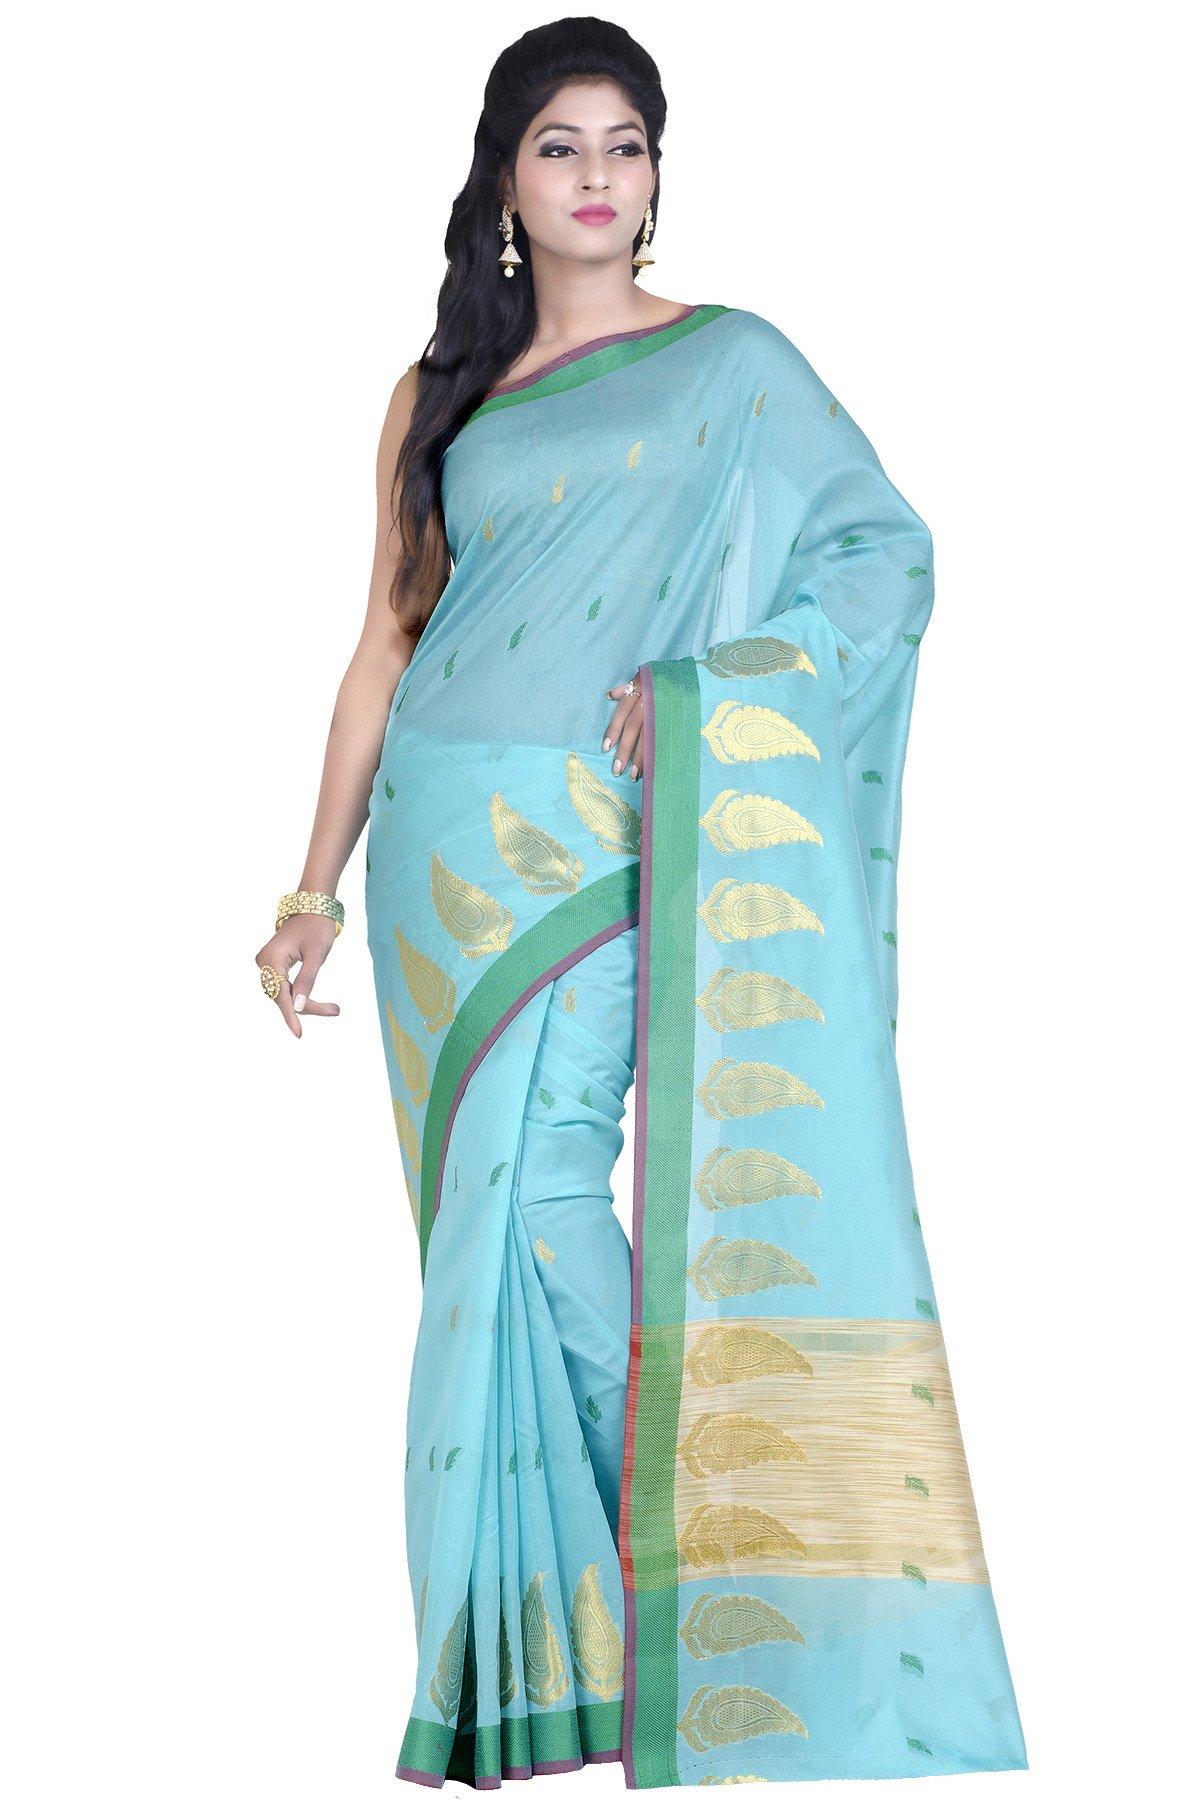 Chandrakala Women's Blue Art Silk Banarasi Saree with unstitched Blousepiece.